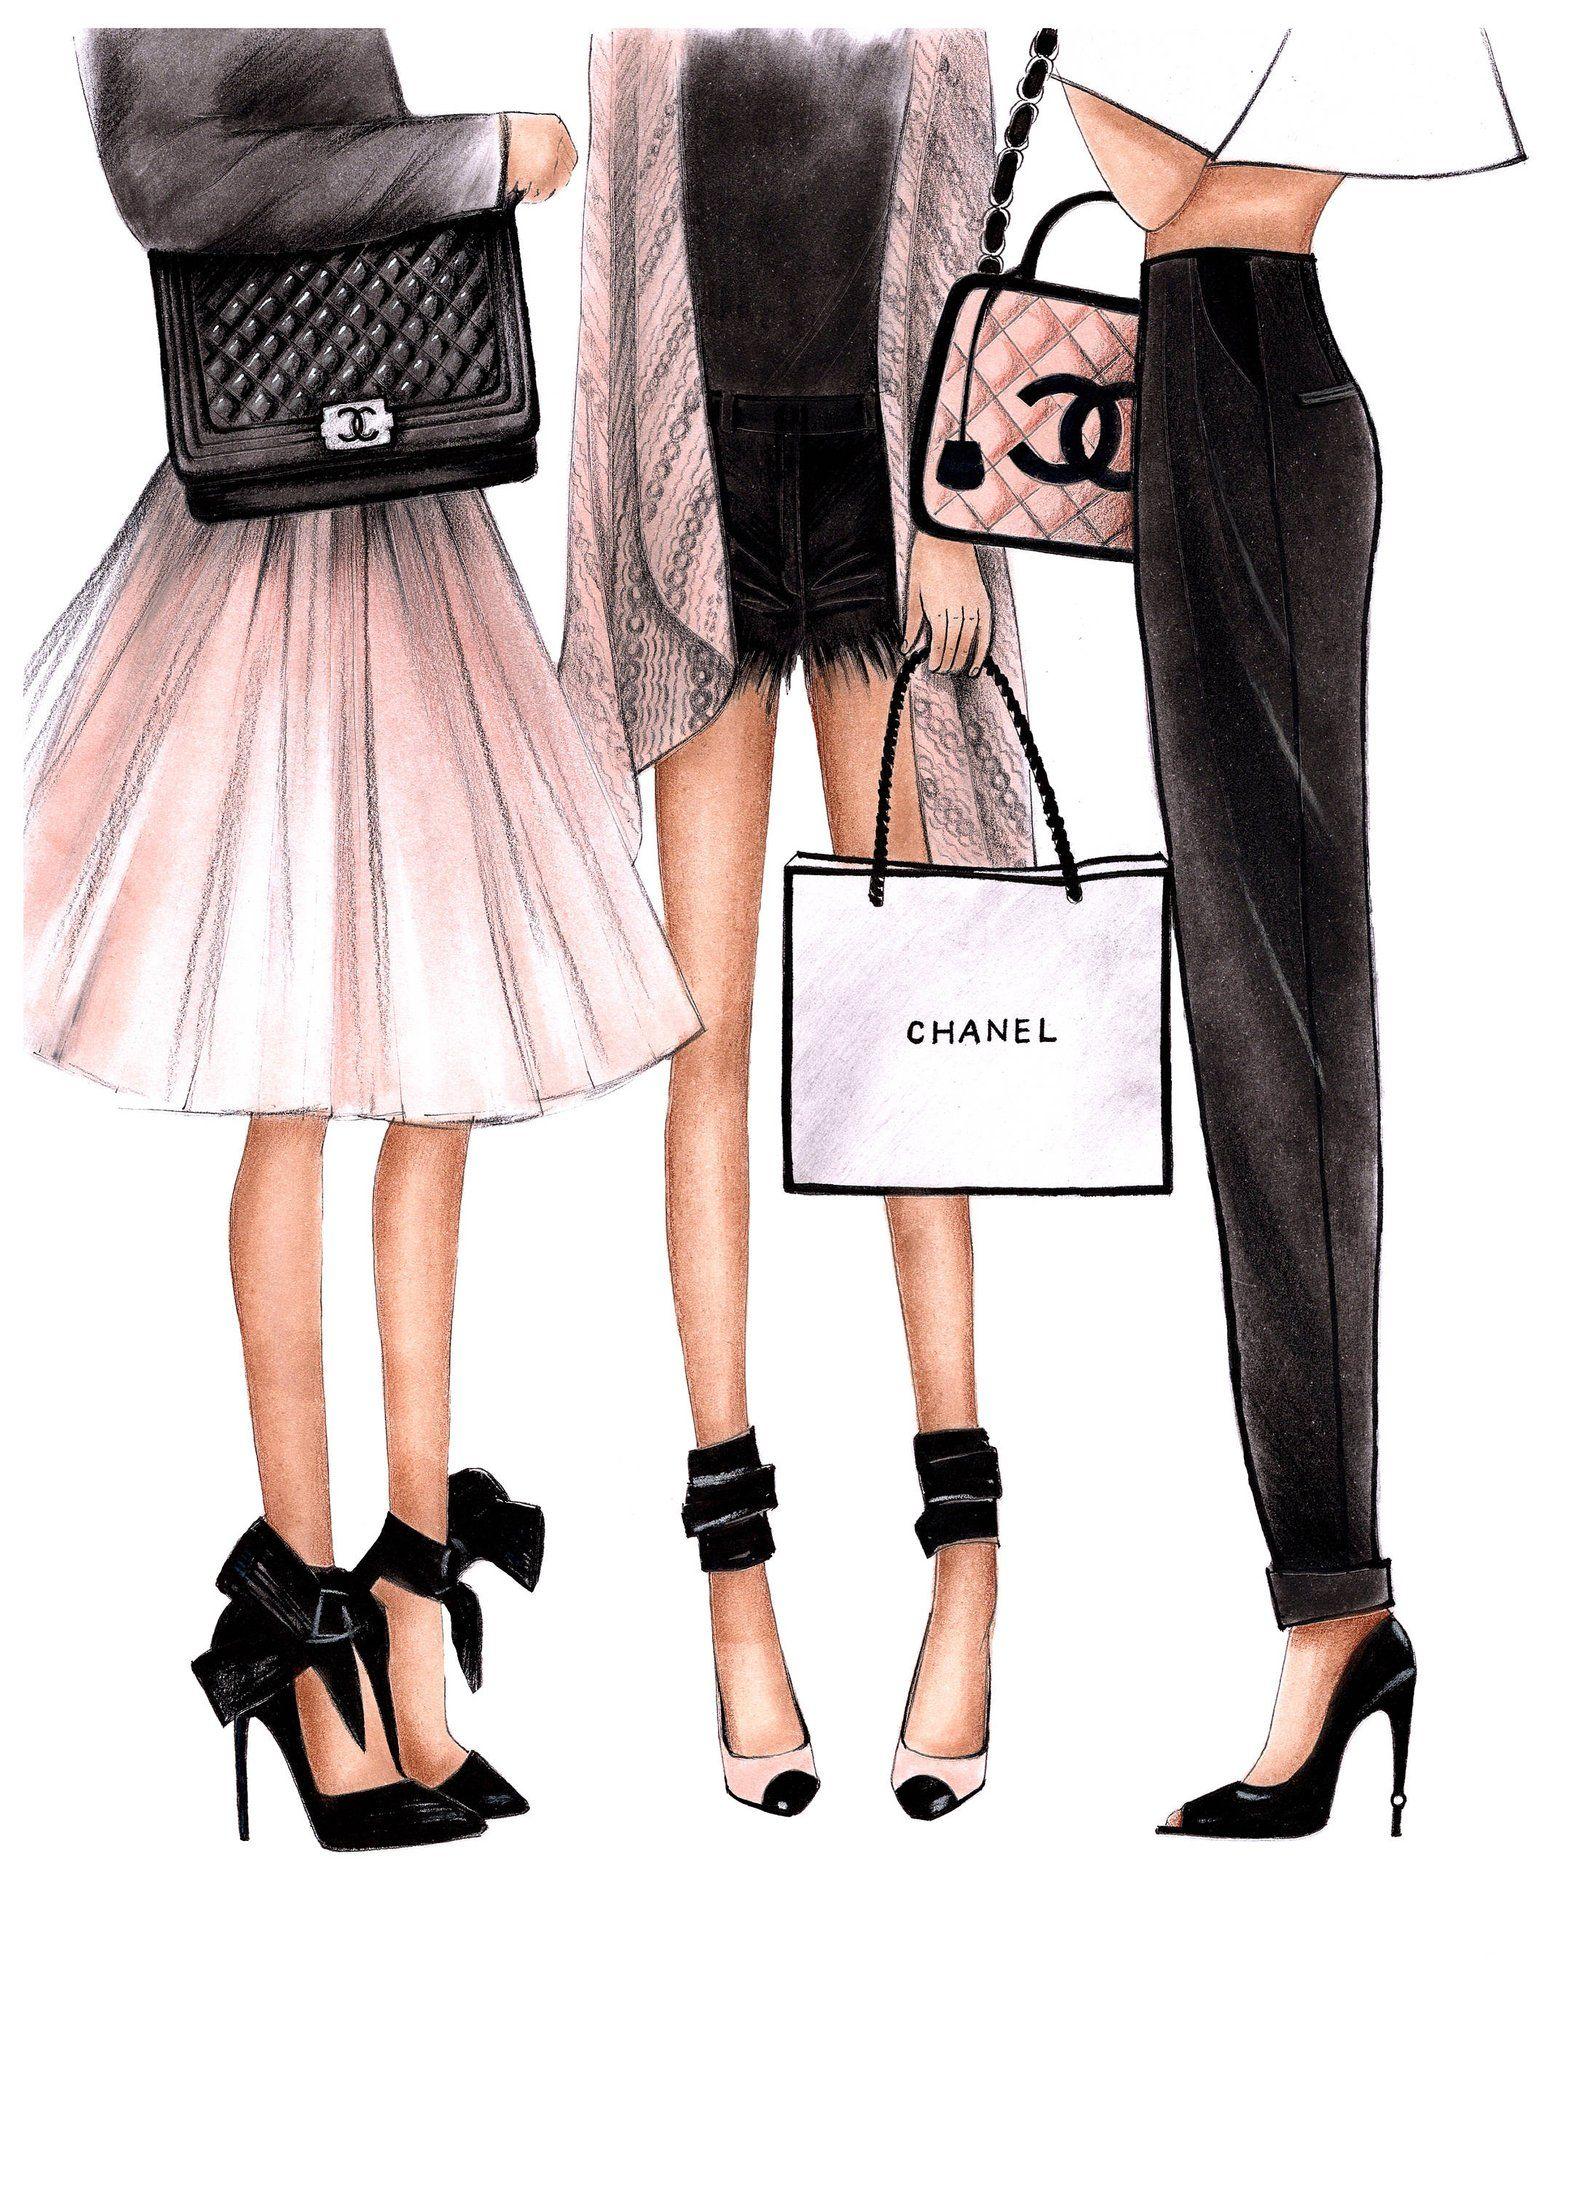 Fashion Illustration Chanel Art Chanel Print Fashion Wall Art Coco Chanel Art Chanel Poster Chanel Art Print Chanel Home Decor Chanel Girls Chanel Print Chanel Art Chanel Art Print